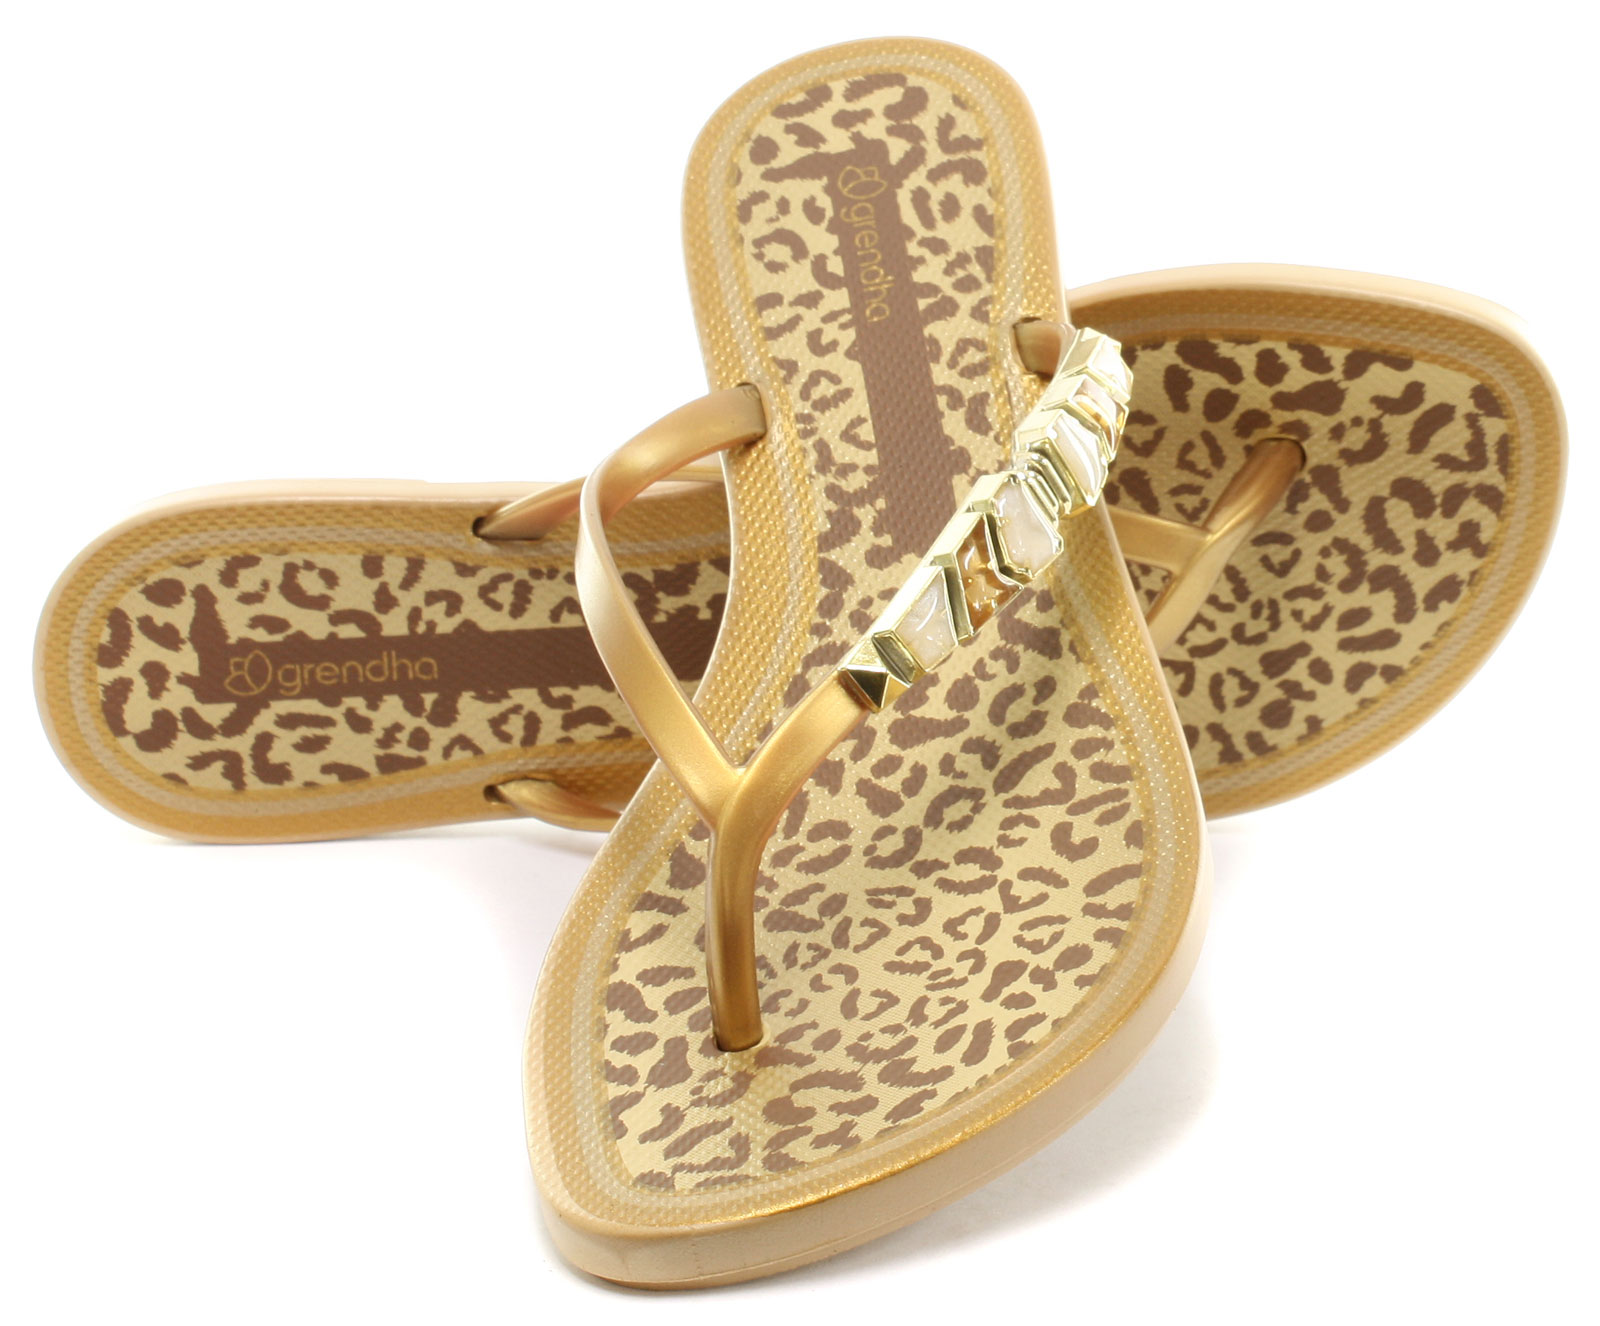 Nuevo Grendha Brasil Joya II Tanga oro flip flop para mujer Talla UK 6 (UE 39)